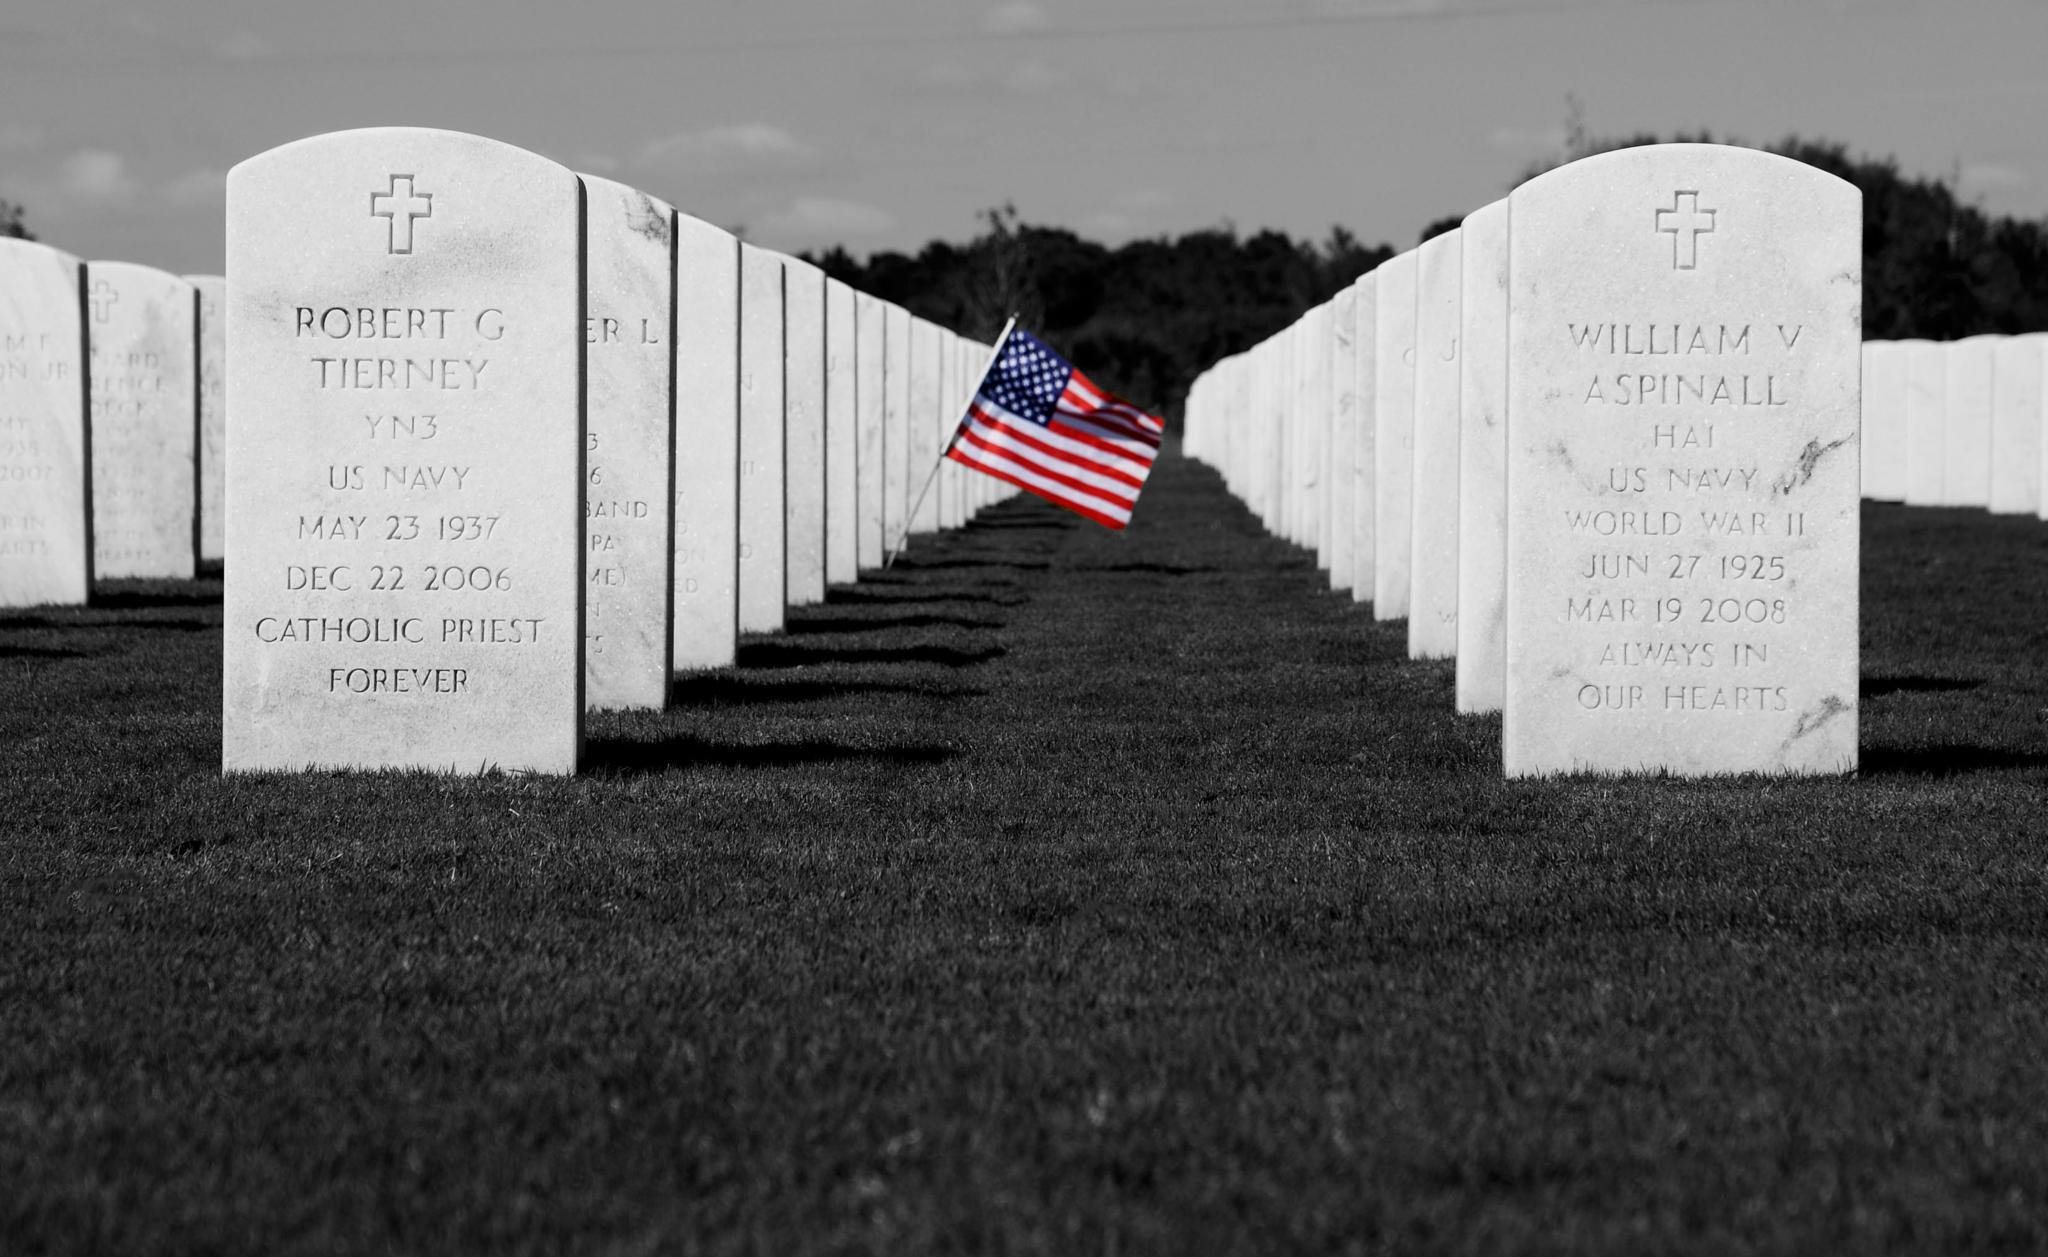 WW2 Veterans Cemetary by pamsheedy